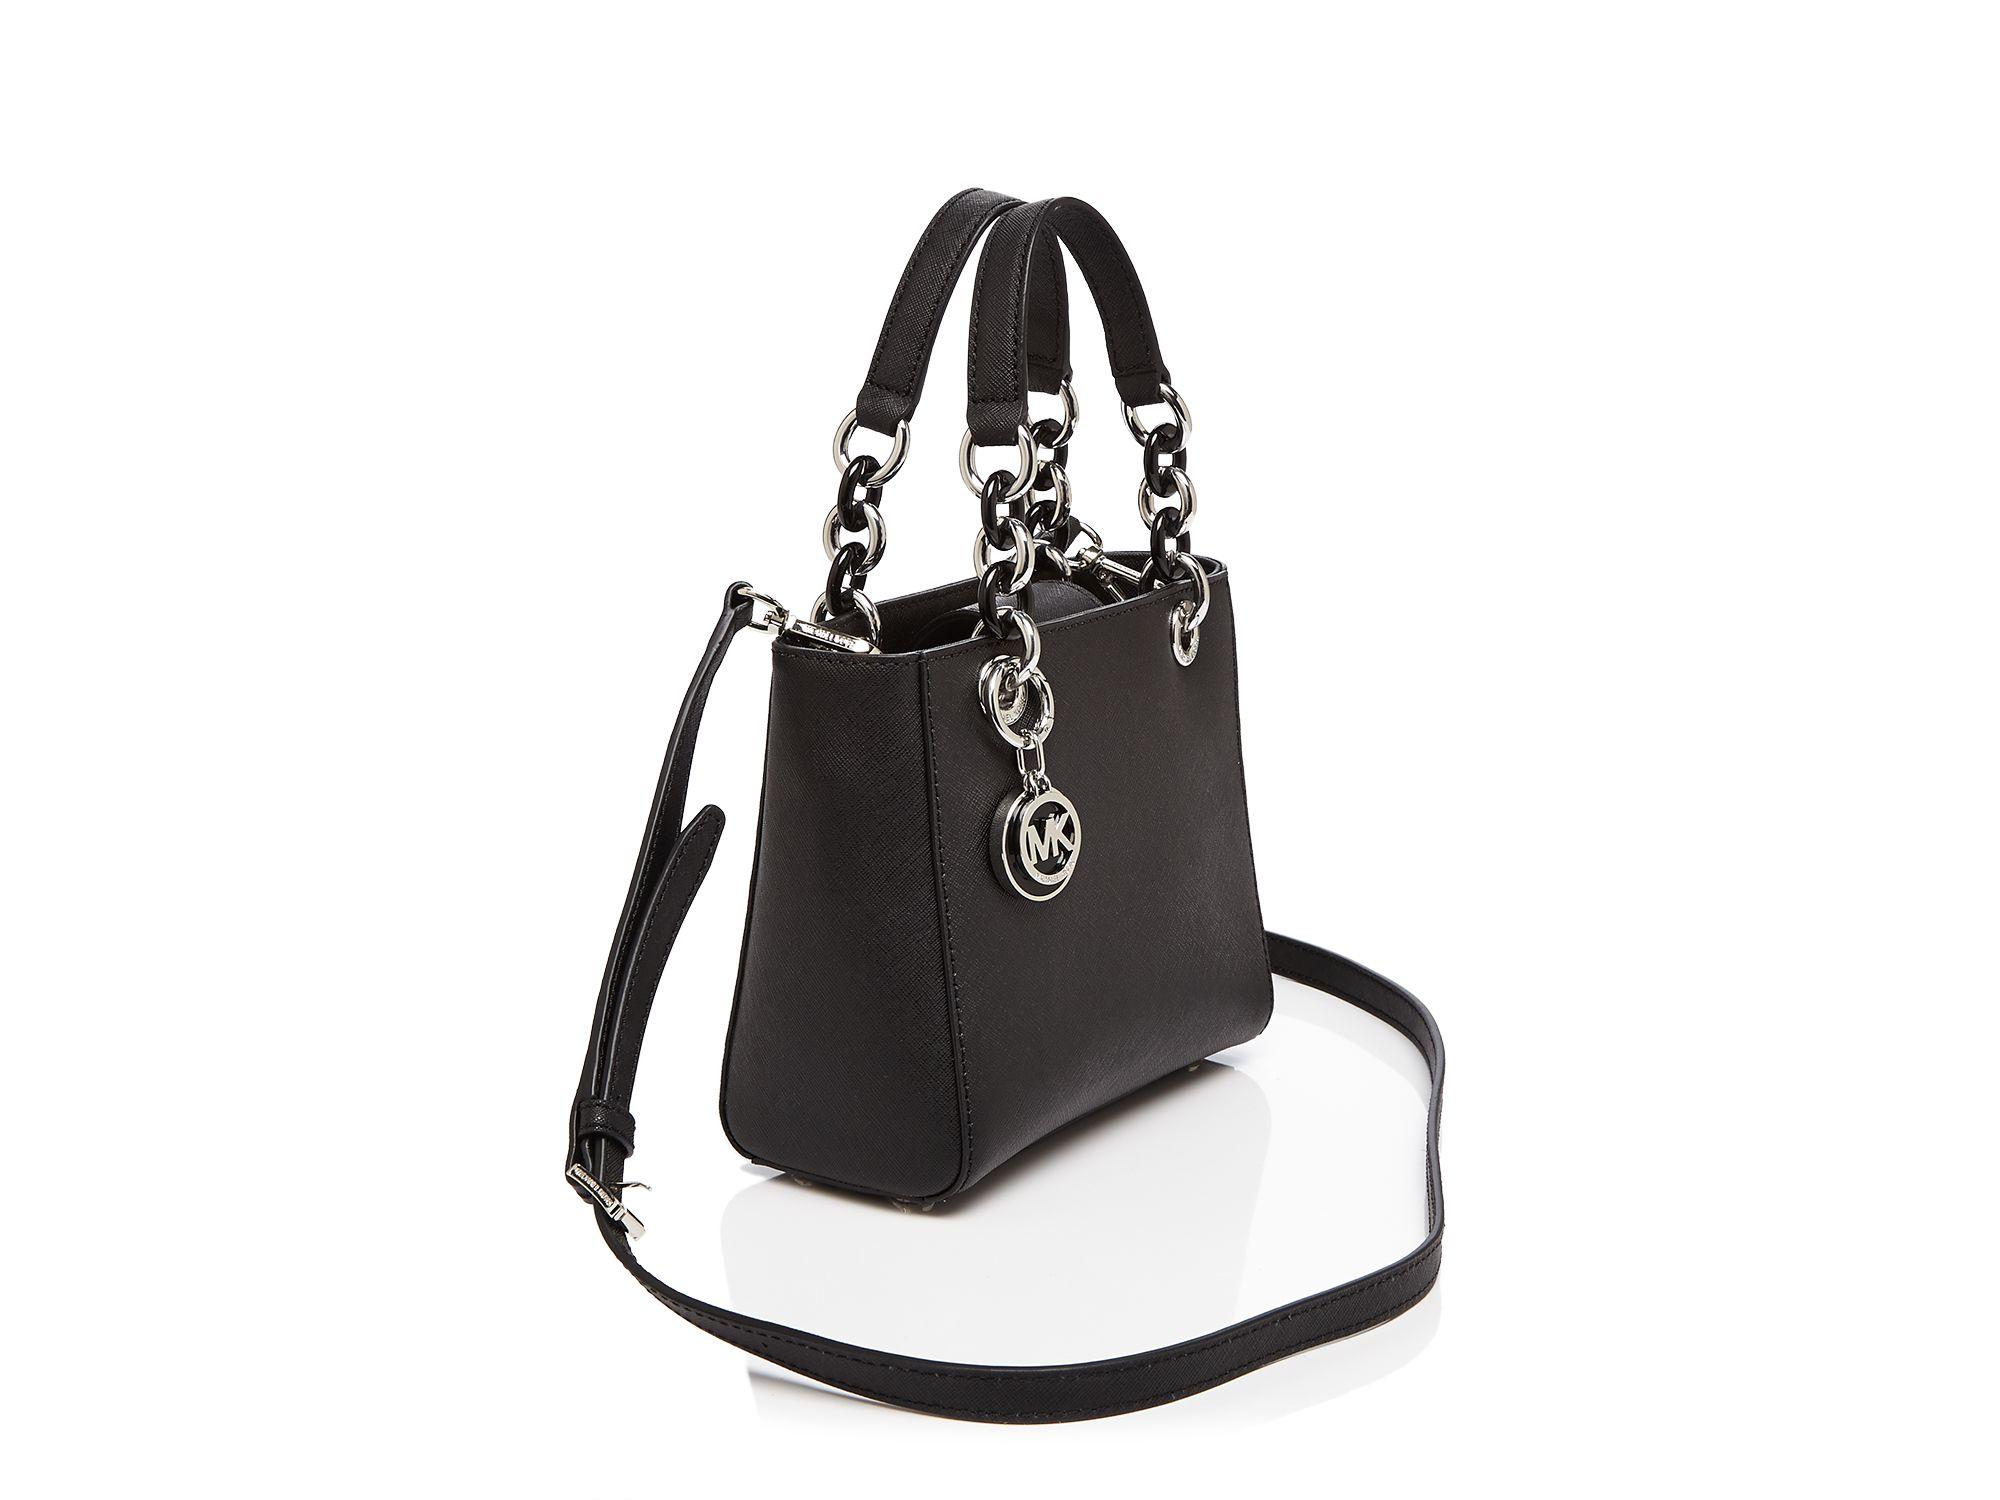 b330fddb3913 ... saffiano leather satchel 96126 5e36d reduced michael michael kors extra small  cynthia satchel in black lyst 4367c 6916e ...